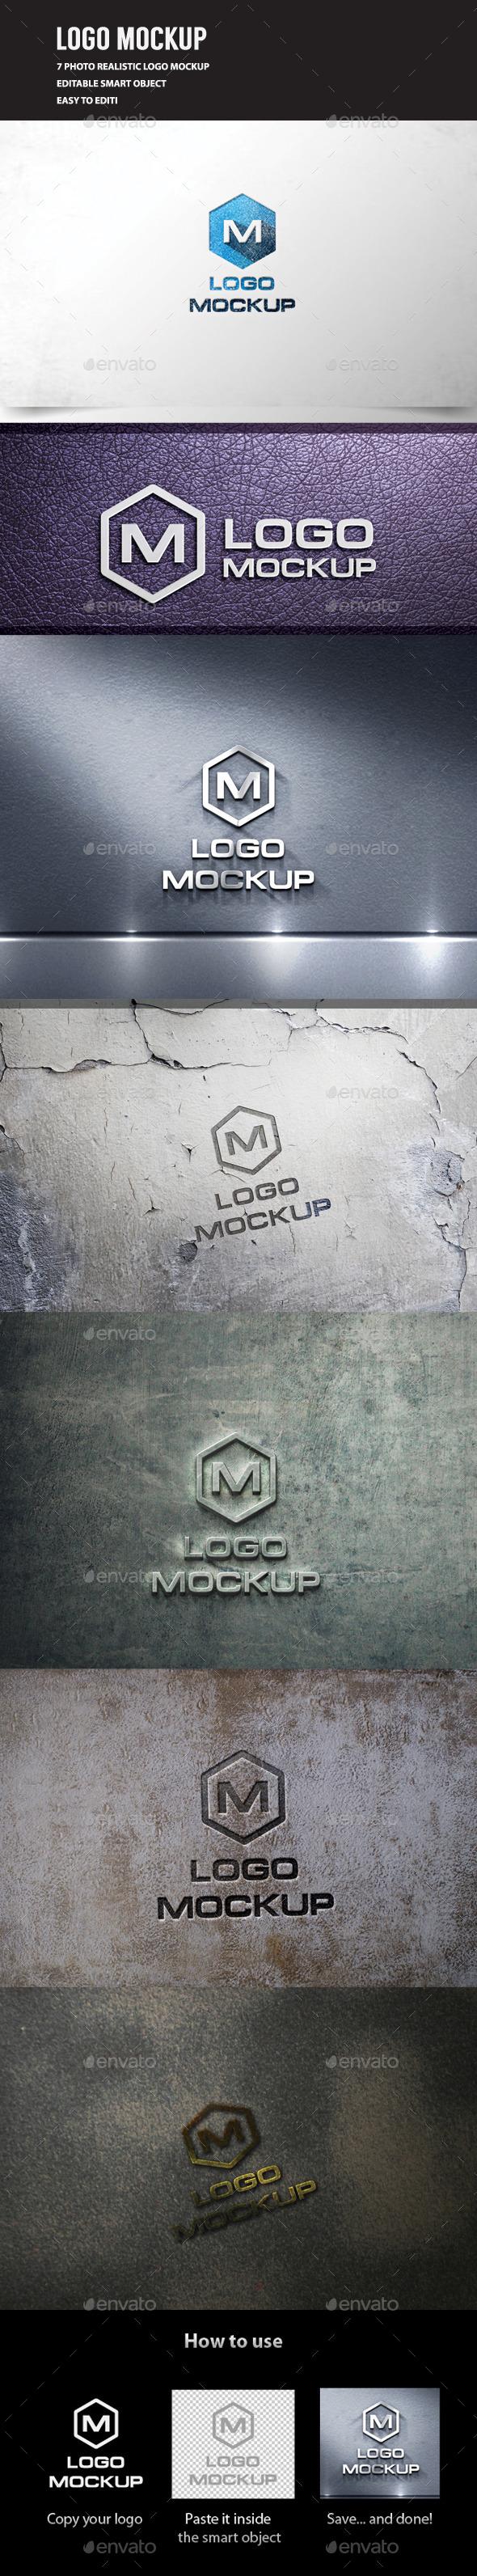 GraphicRiver 3D Logo Mockup Vol.3 11852975